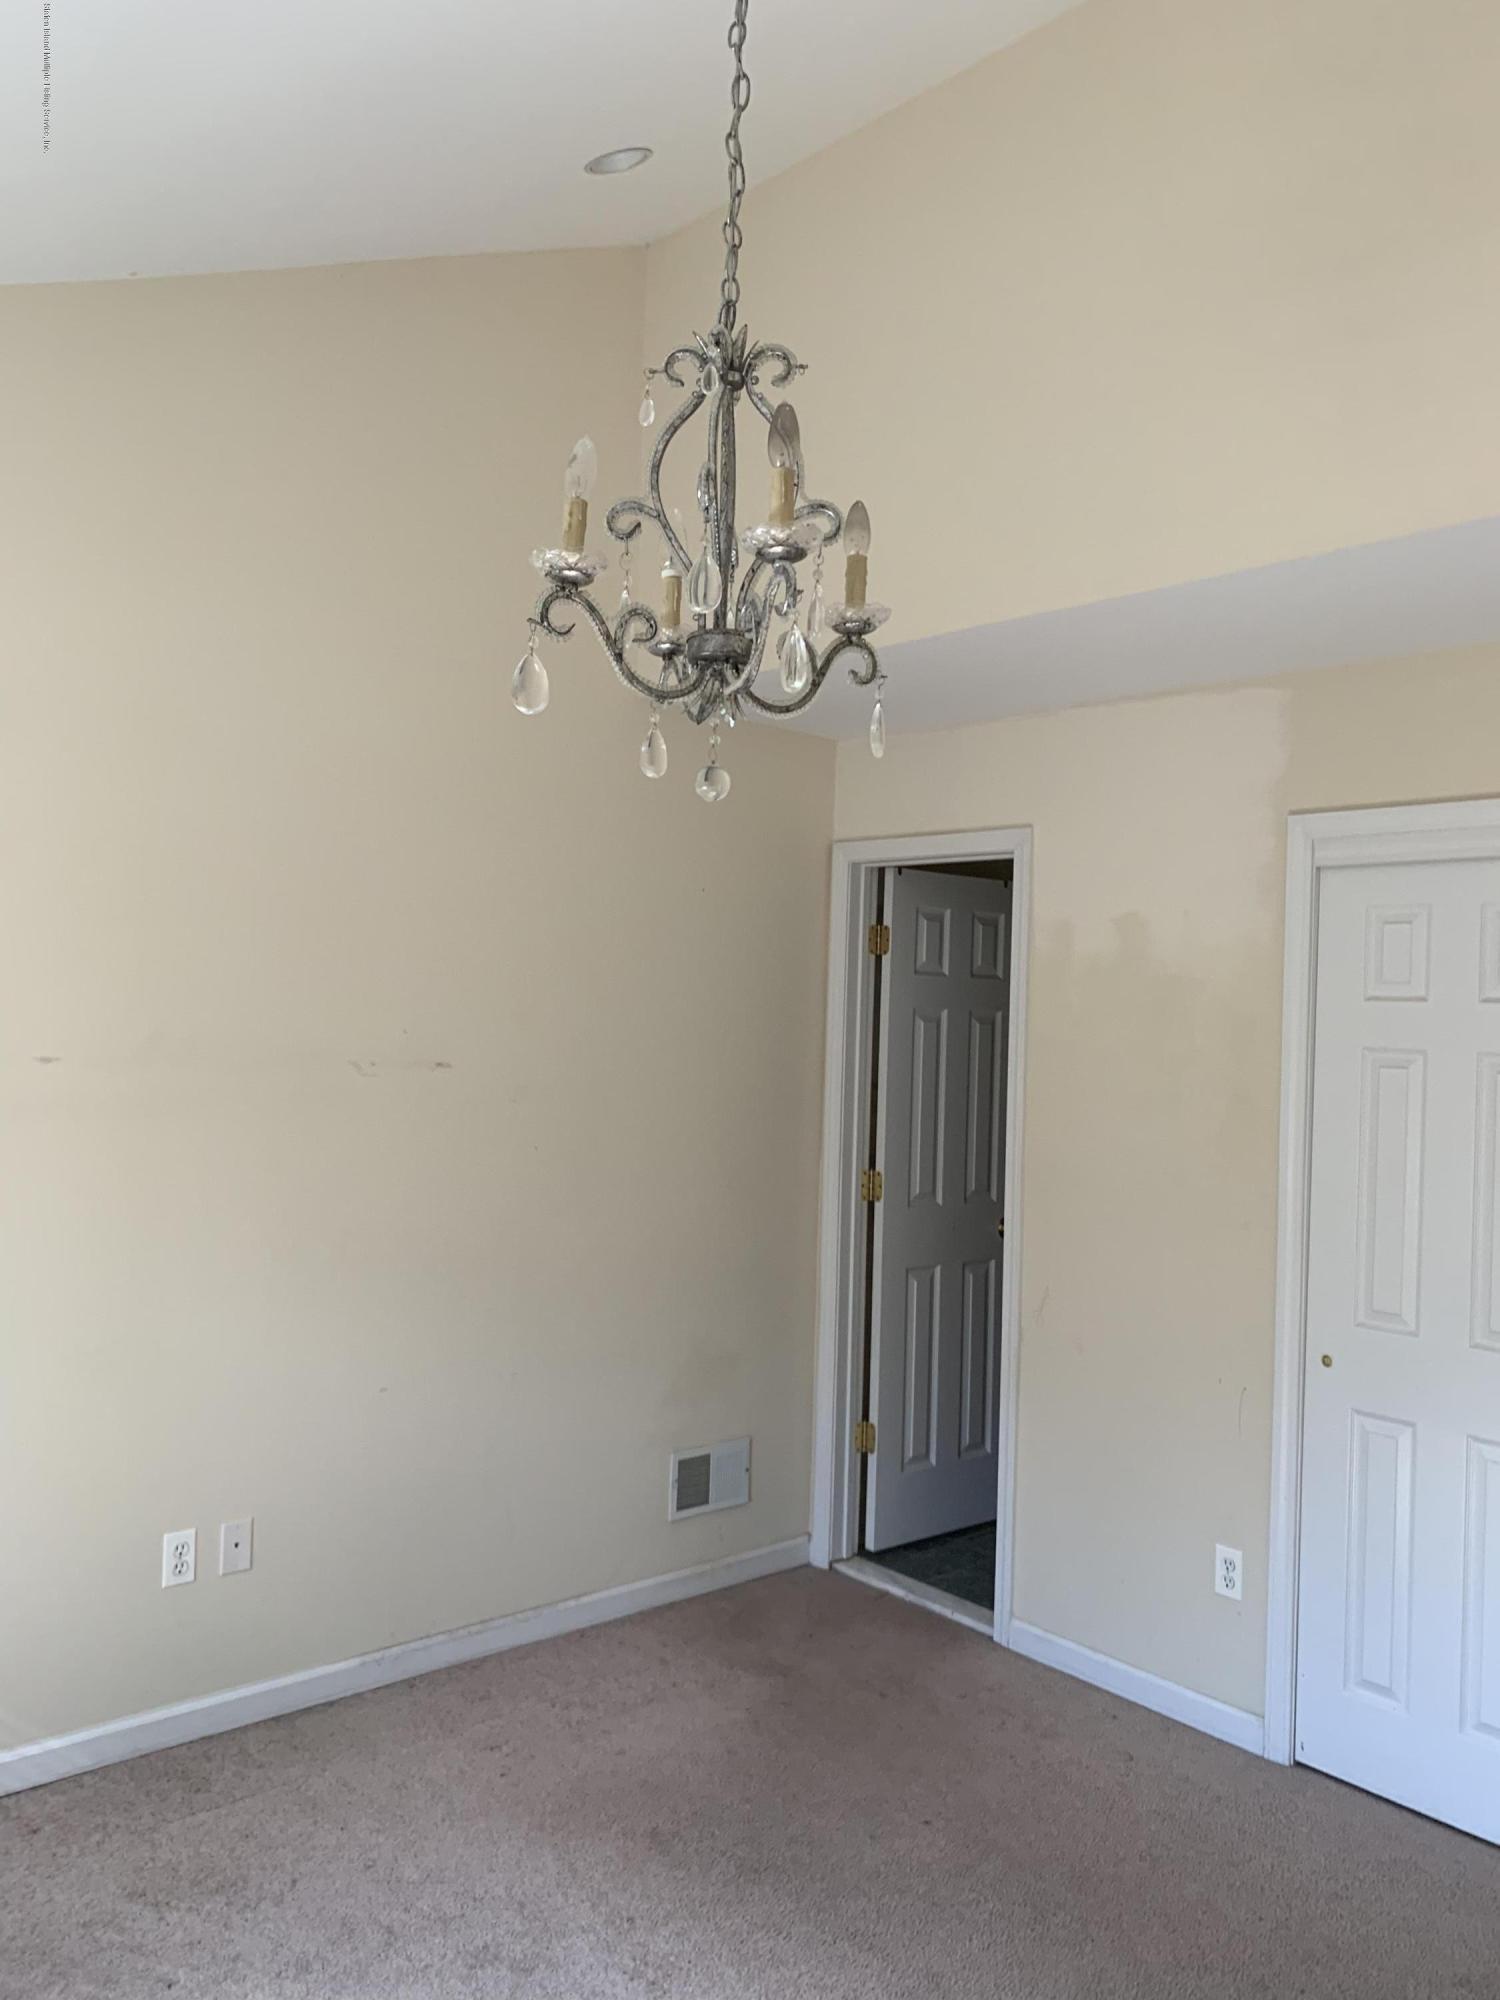 194 Dartmouth Loop,Staten Island,New York,10306,United States,3 Bedrooms Bedrooms,6 Rooms Rooms,3 BathroomsBathrooms,Res-Rental,Dartmouth,1135606